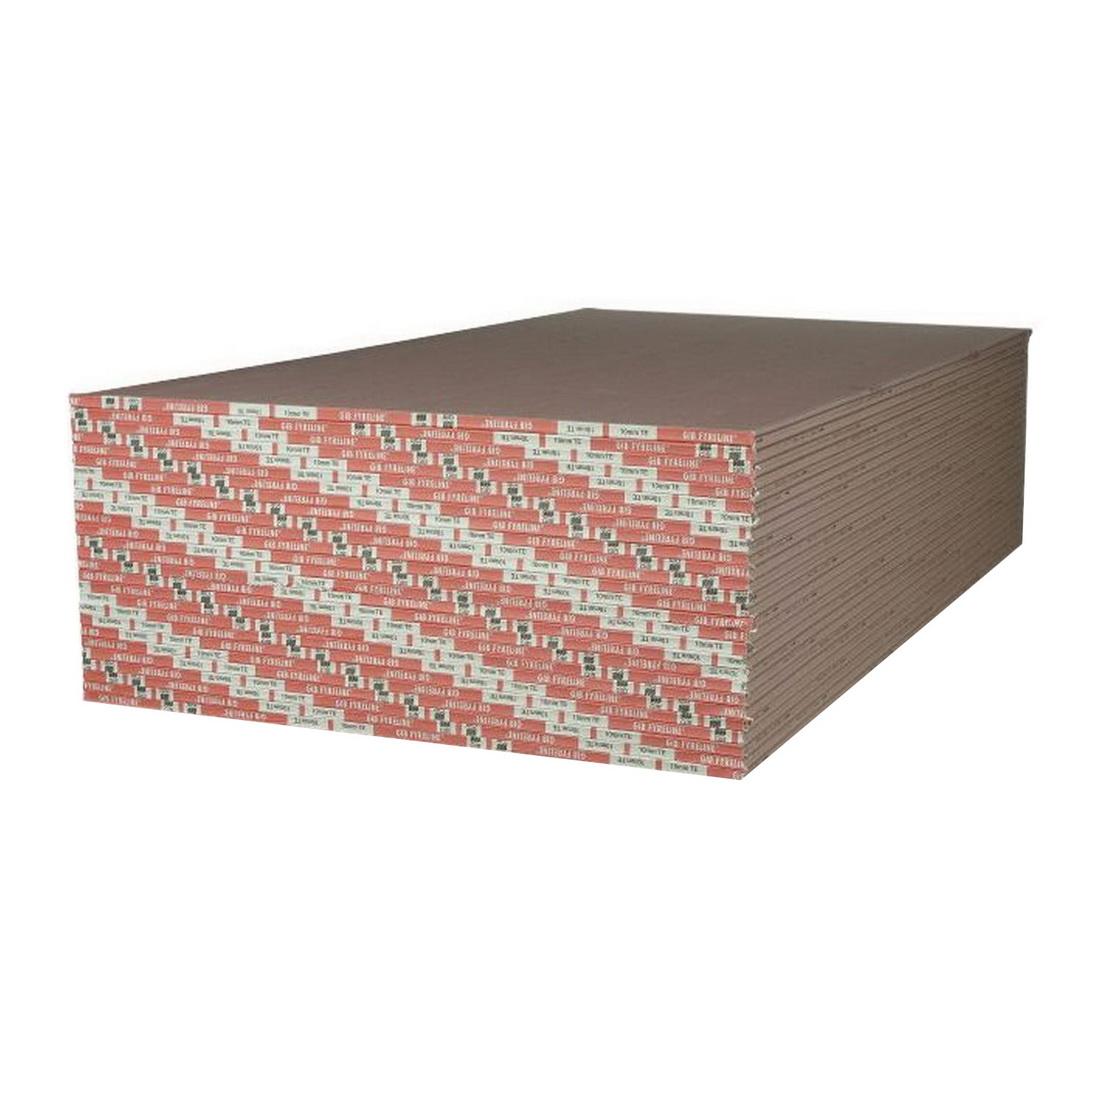 Fyreline Plasterboard 3000 x 1200 x 13mm 11683